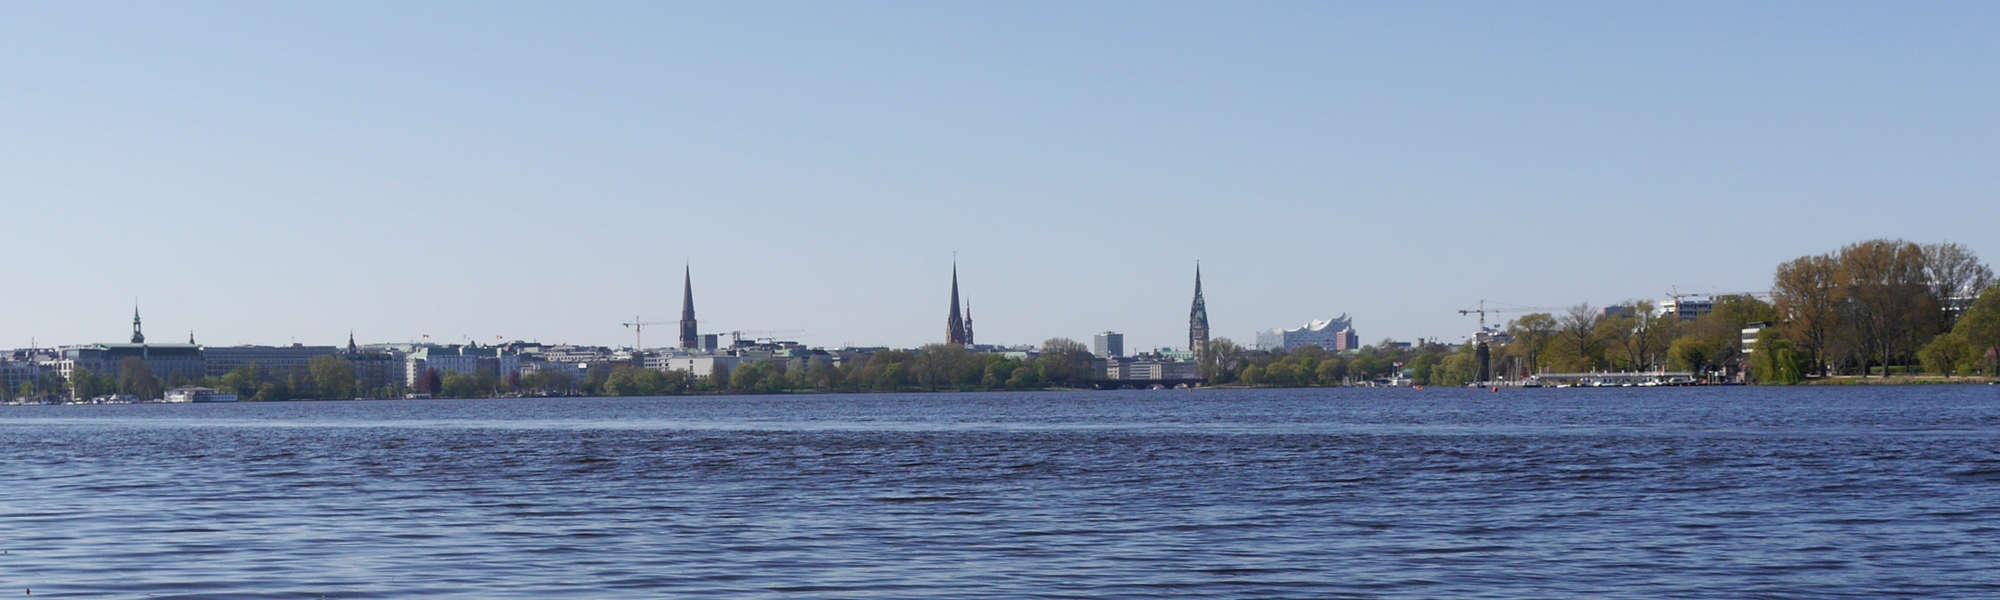 Hamburg Aussenalster Blick auf Skyline - Foto: FOLLOW ME Hamburg